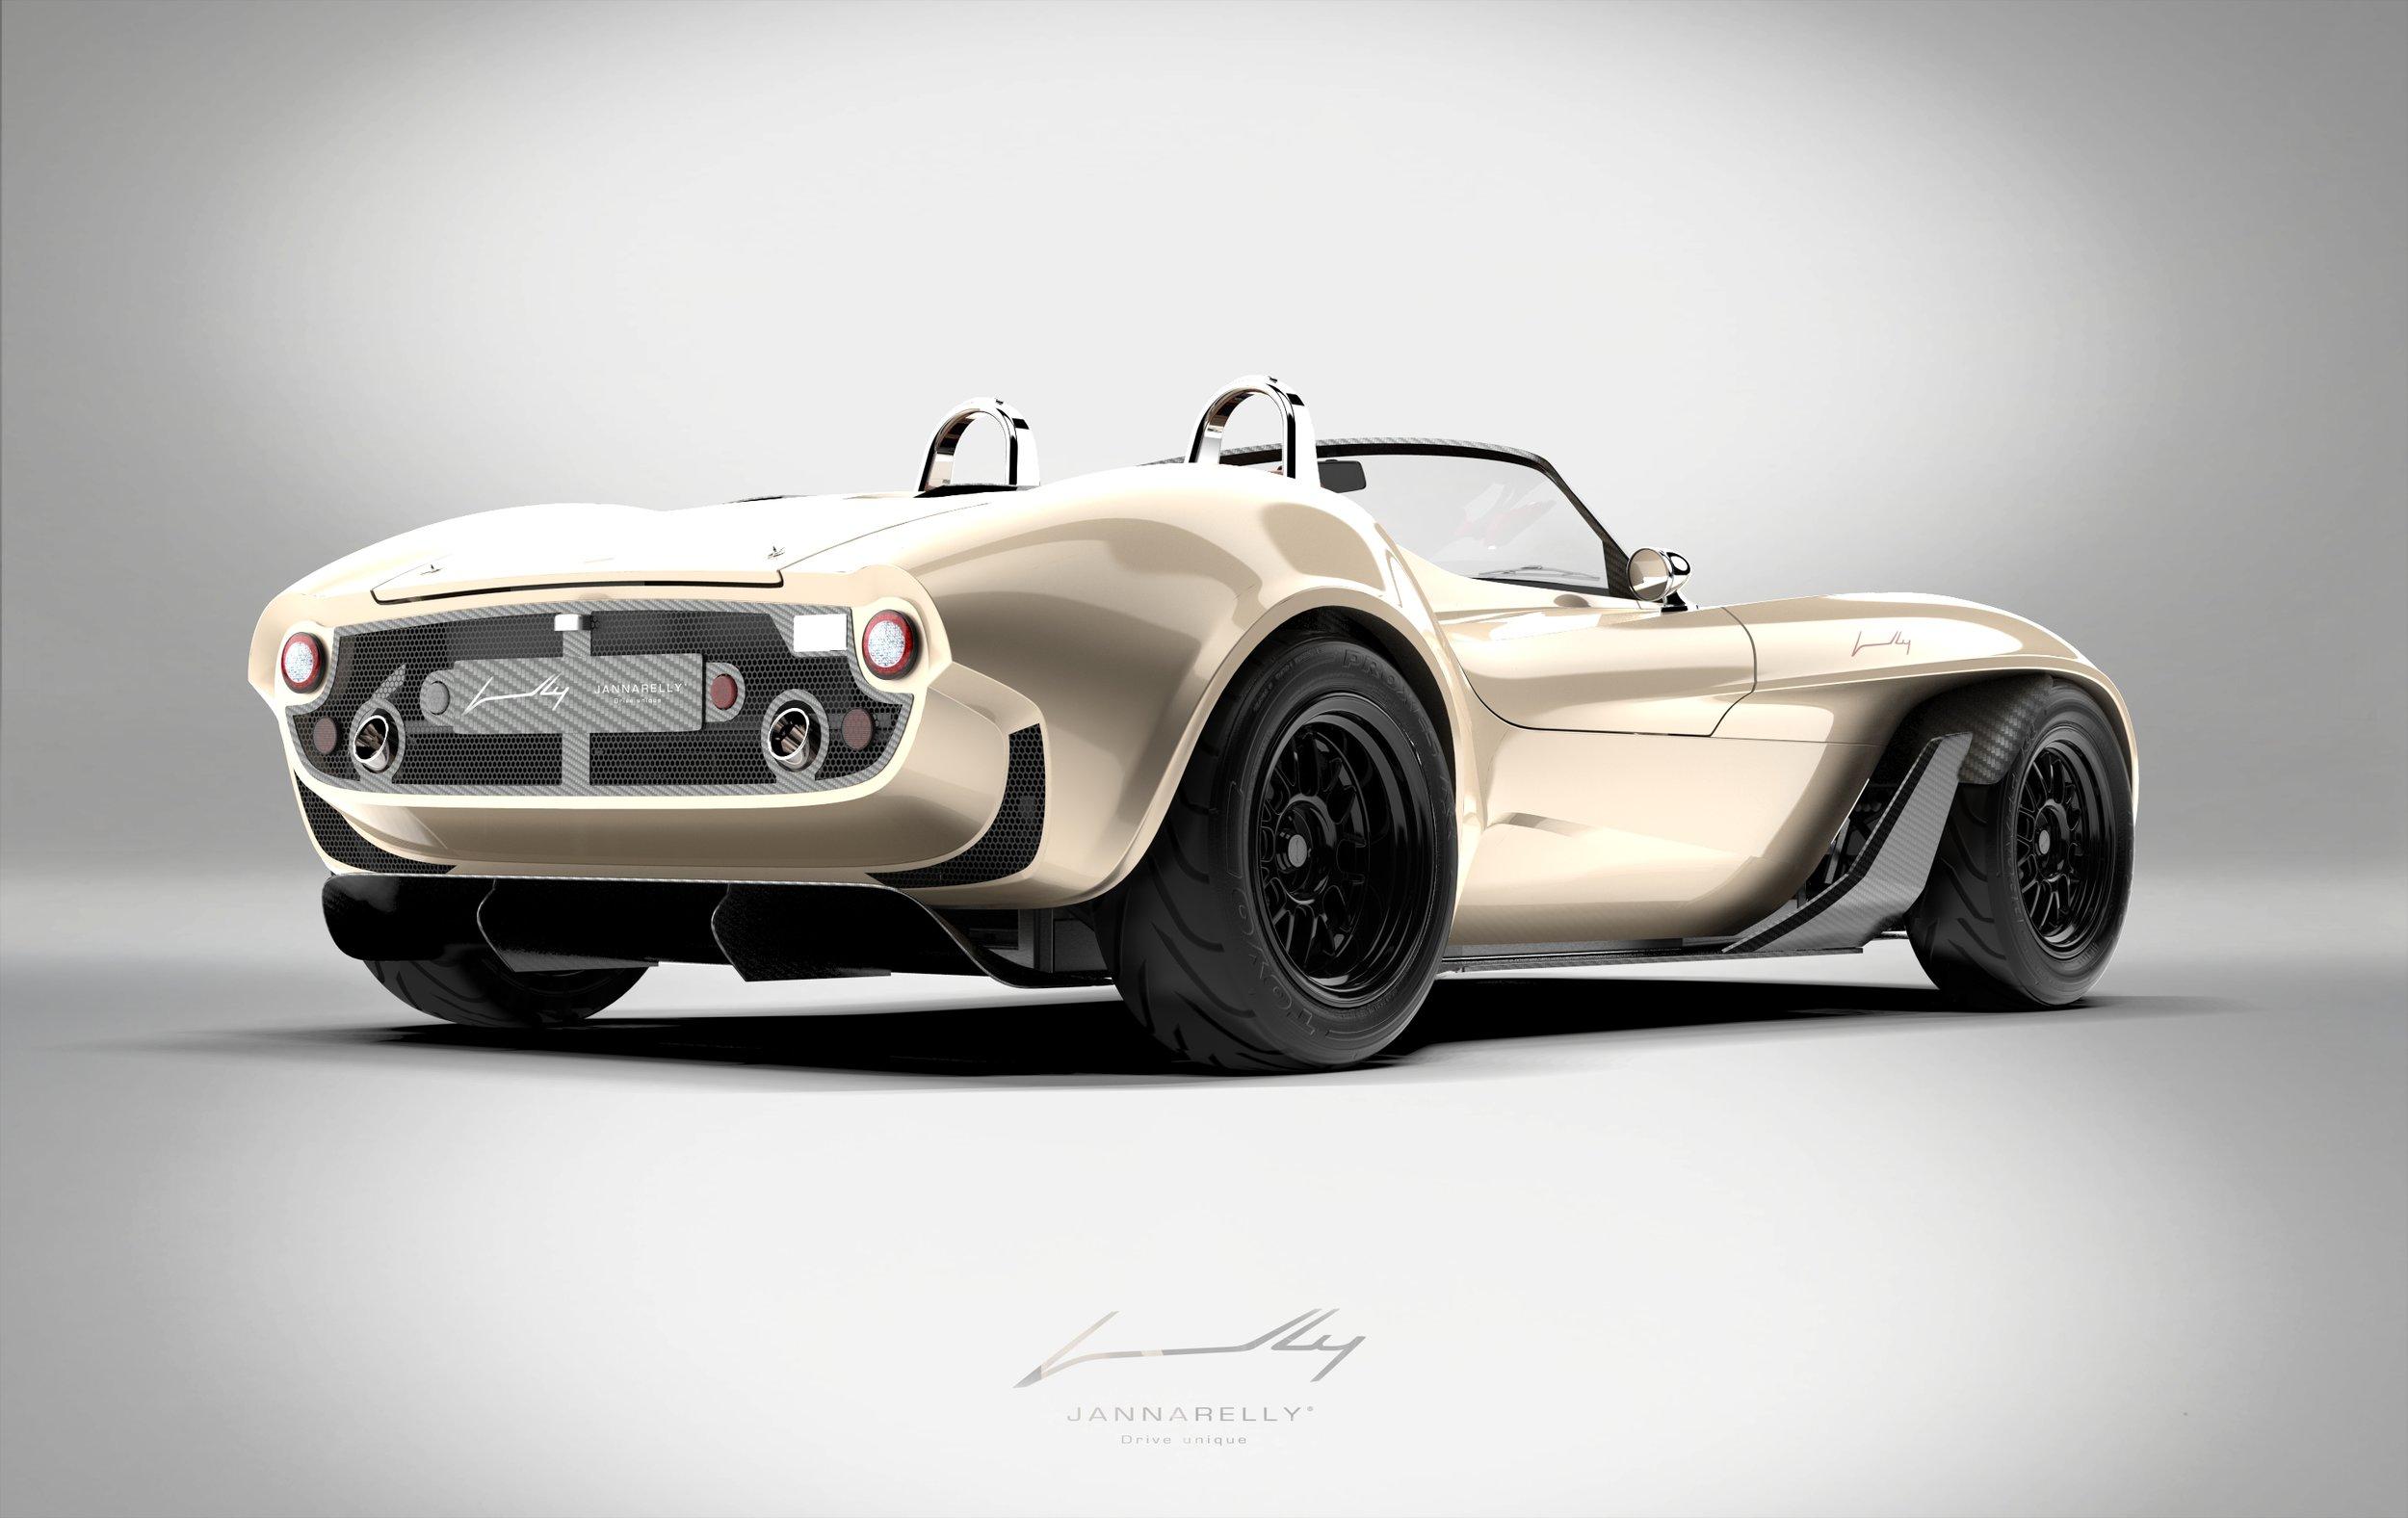 J design1 roadster.302.jpg